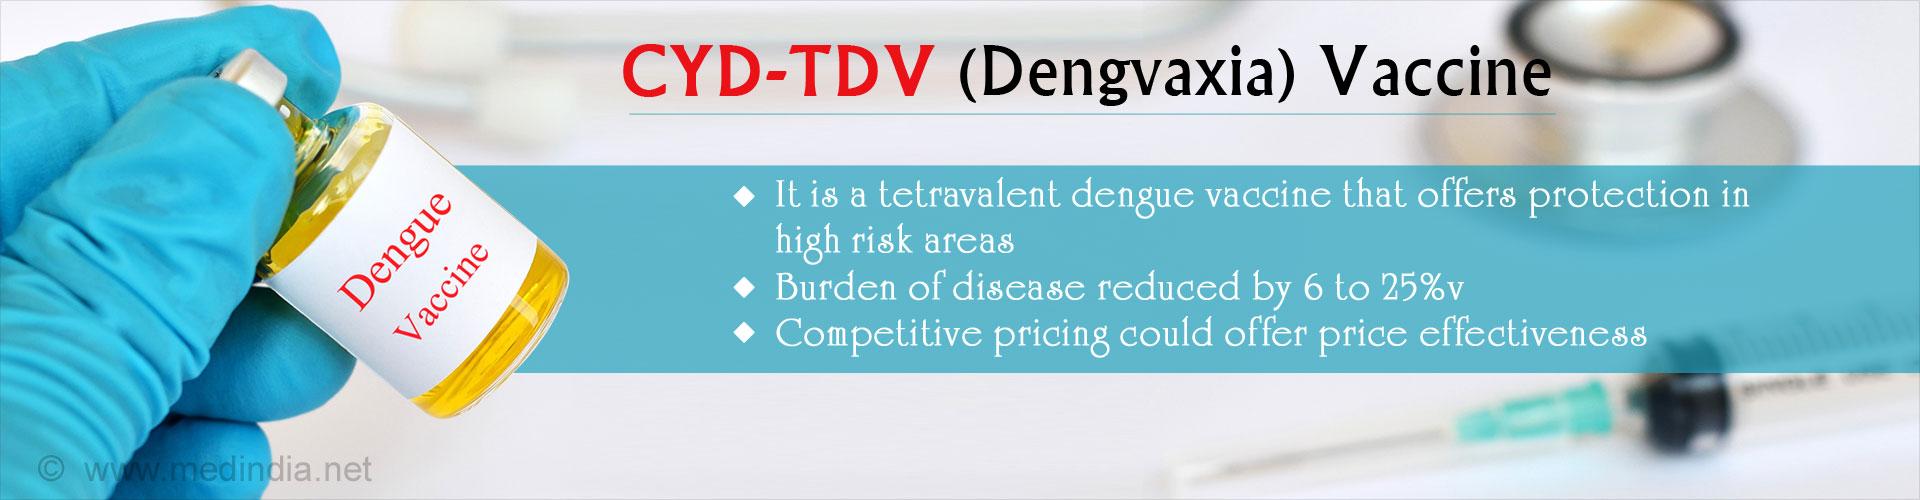 Dengue Vaccine Promises Reduction in Disease Burden